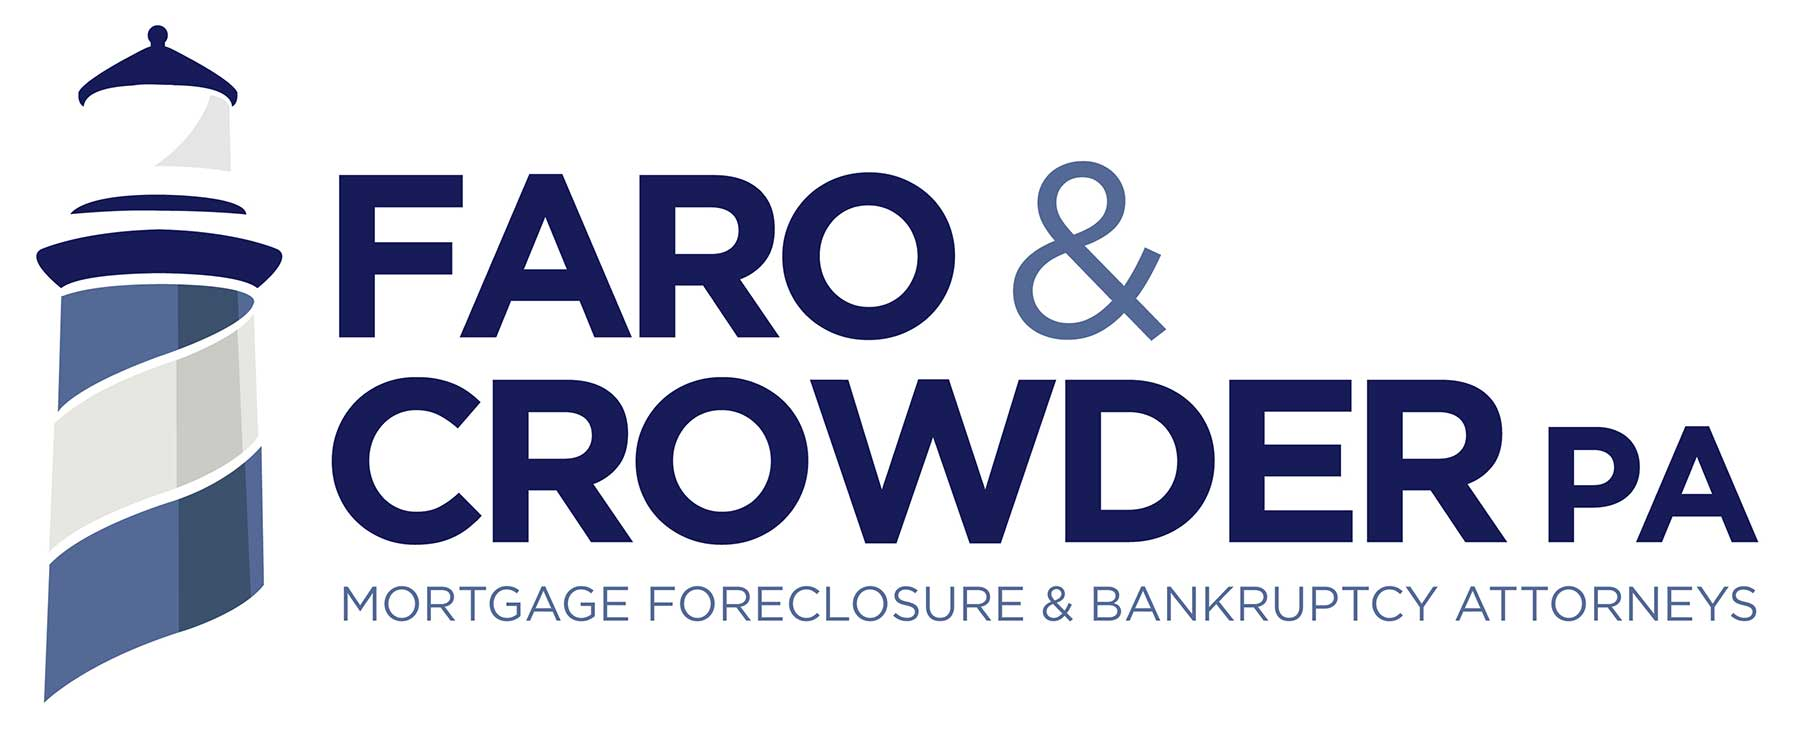 Faro & Crowder, PA - Mortgage Foreclosure & Bankruptcy Attorneys